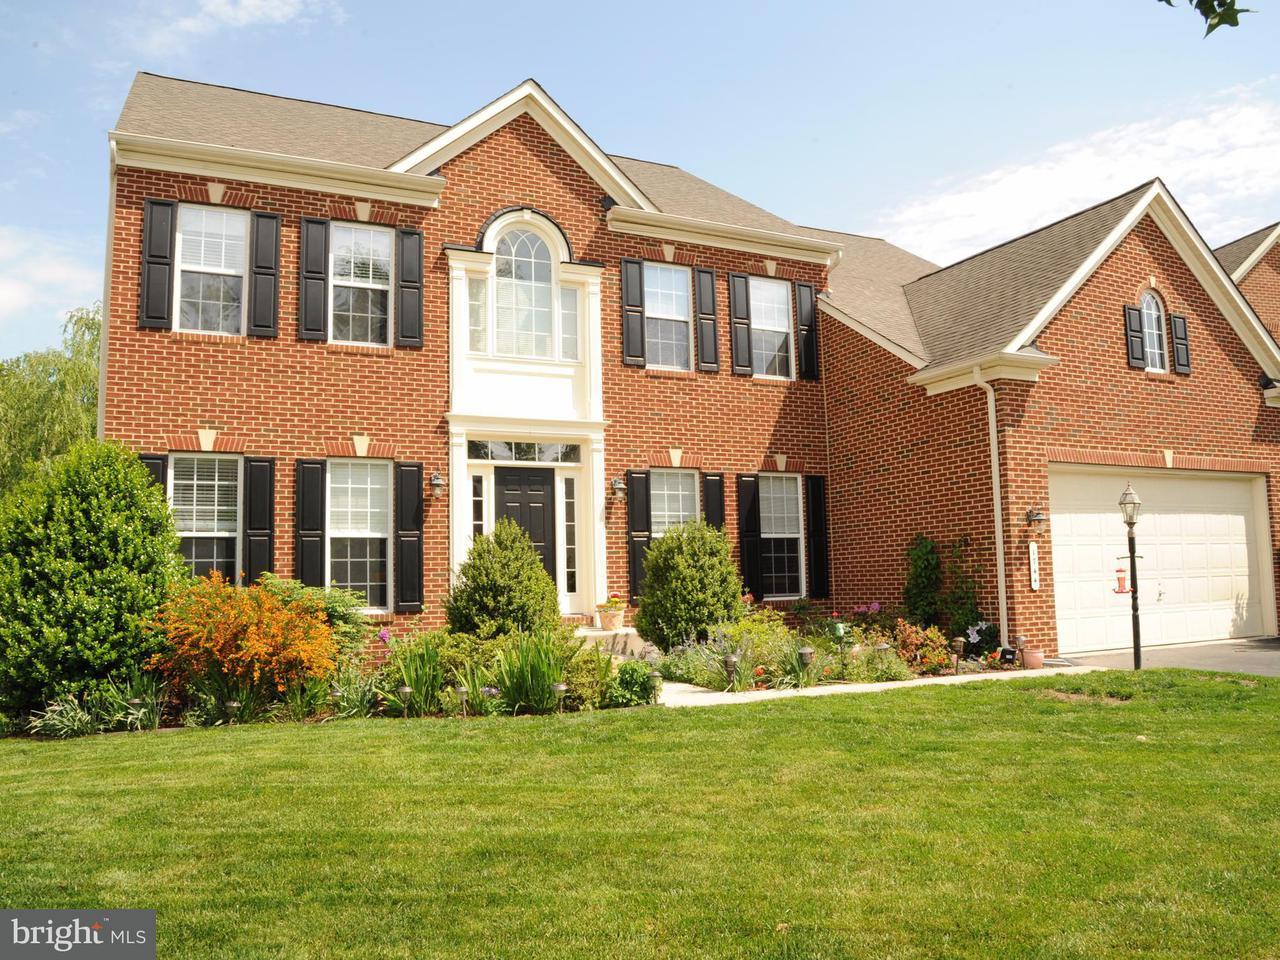 Частный односемейный дом для того Продажа на 1744 ALLERFORD Drive 1744 ALLERFORD Drive Hanover, Мэриленд 21076 Соединенные Штаты